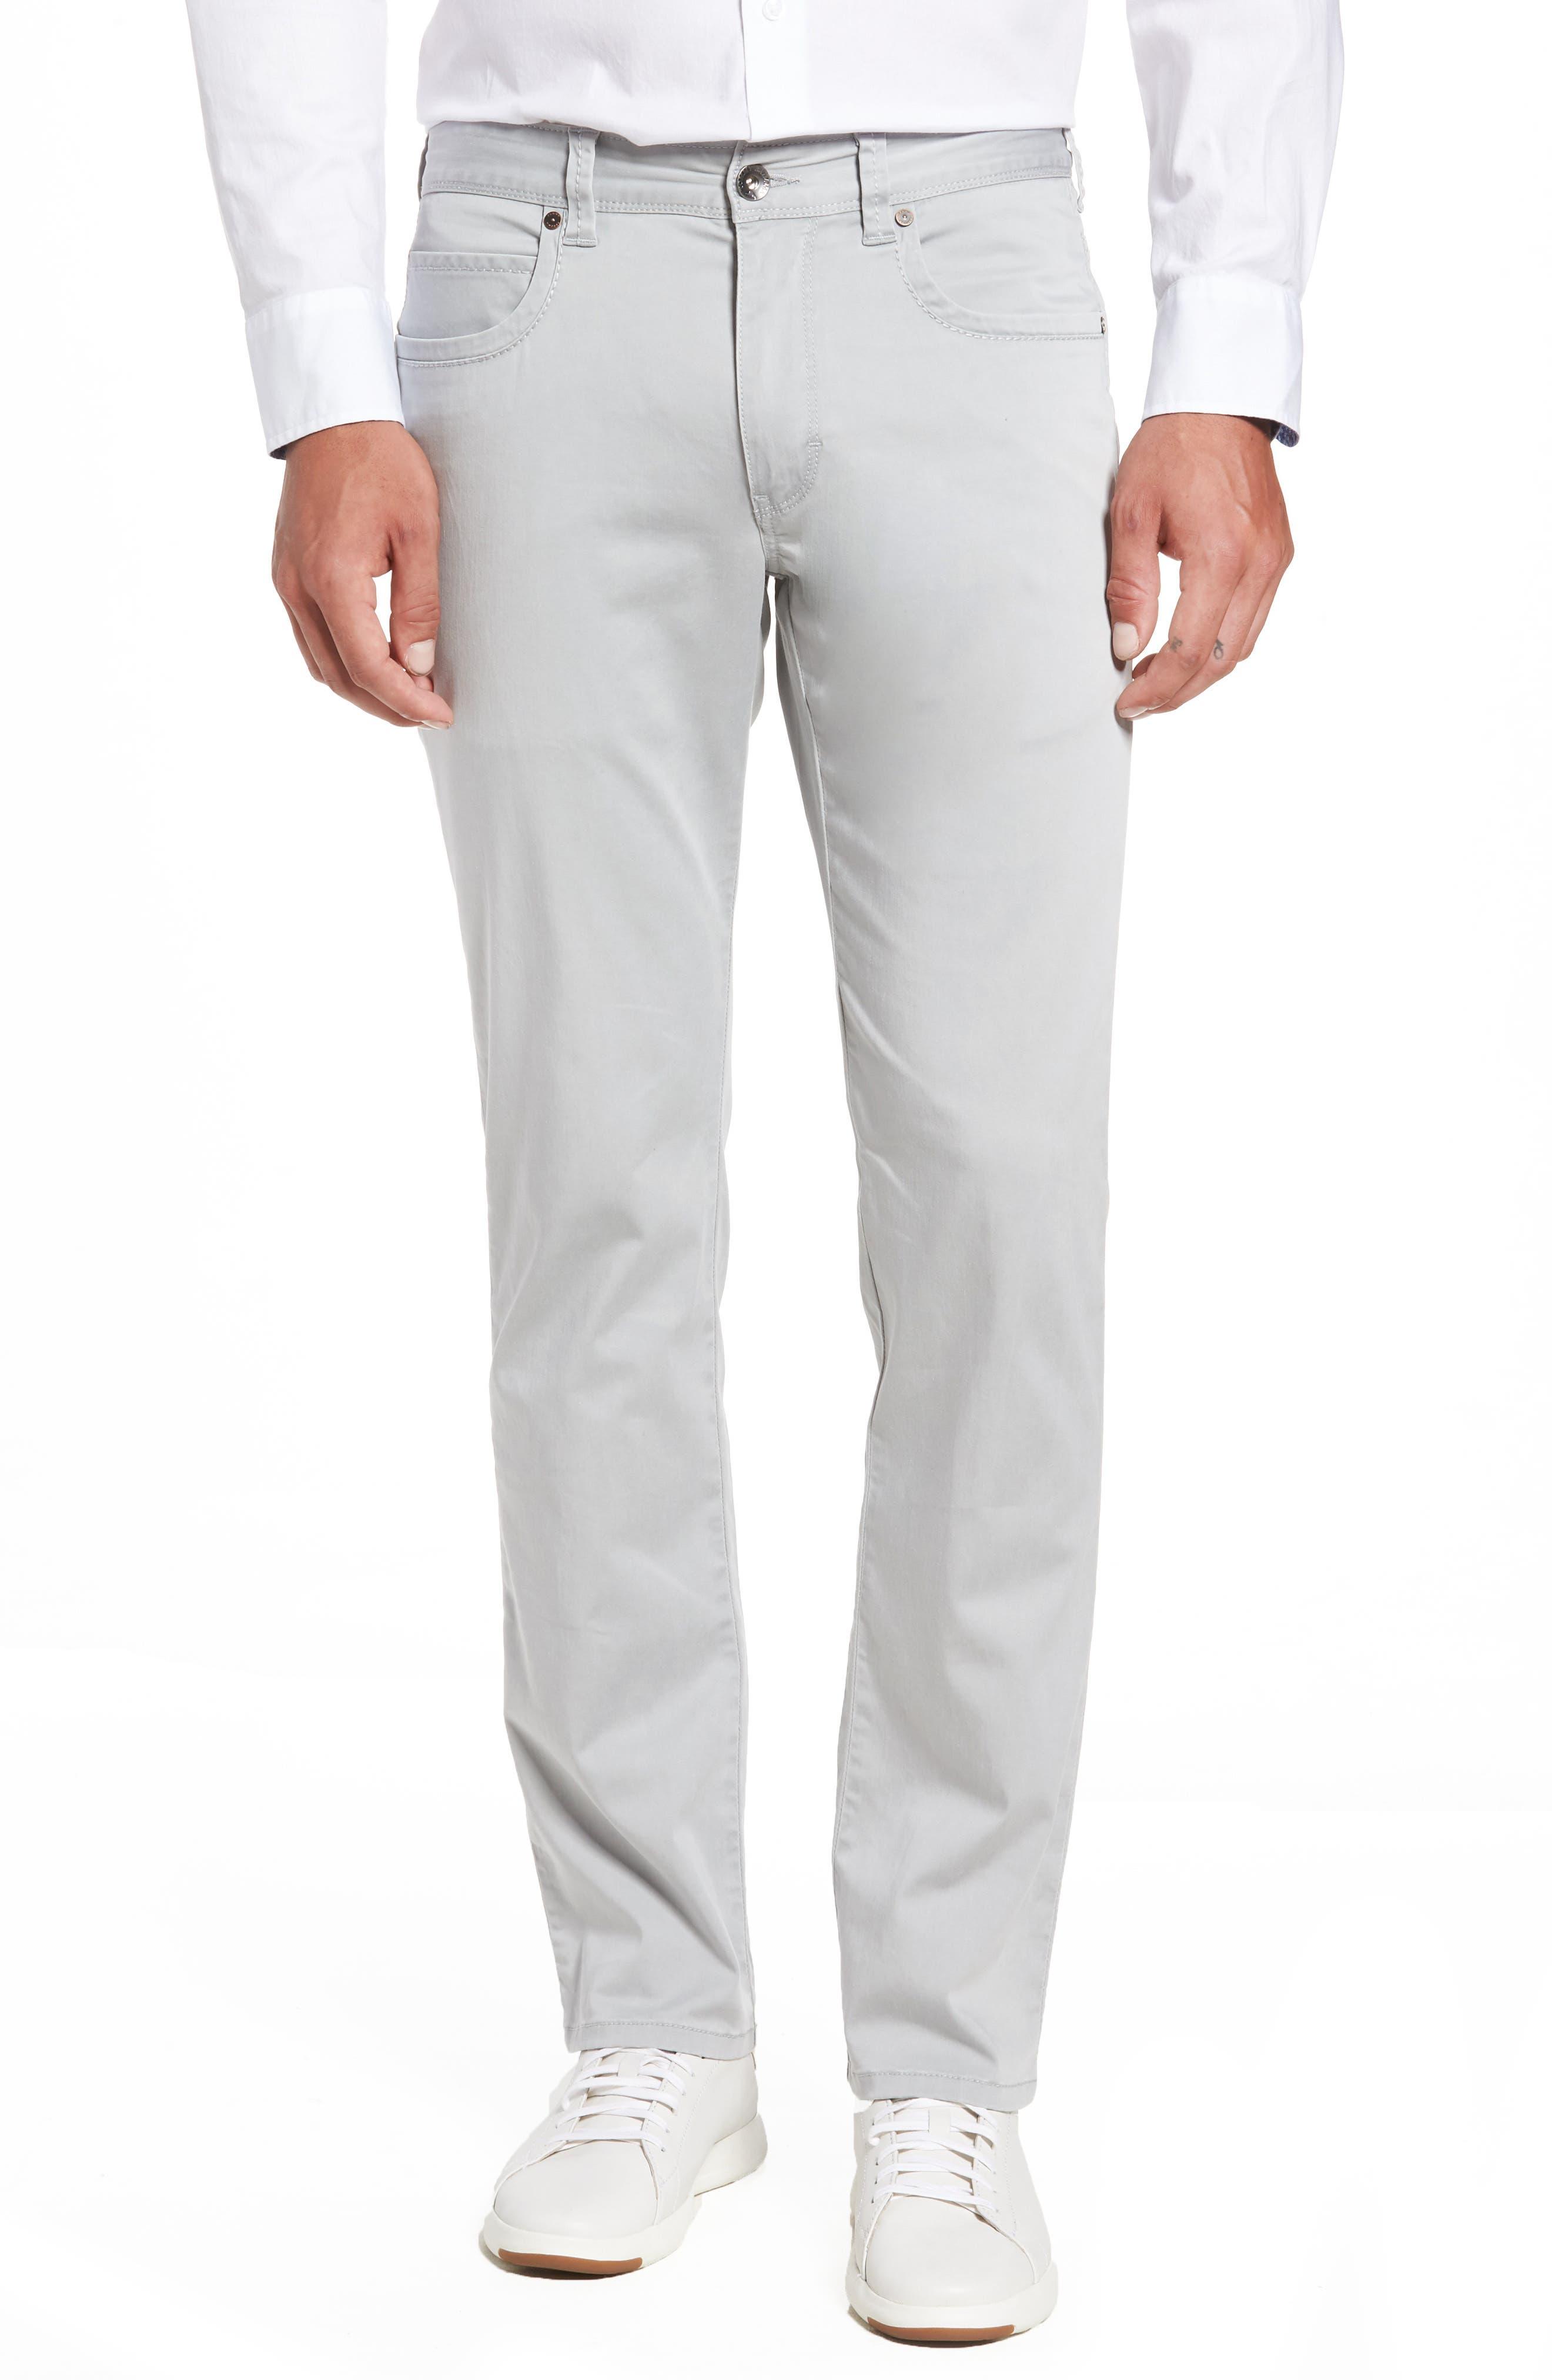 Boracay Pants,                         Main,                         color, 050